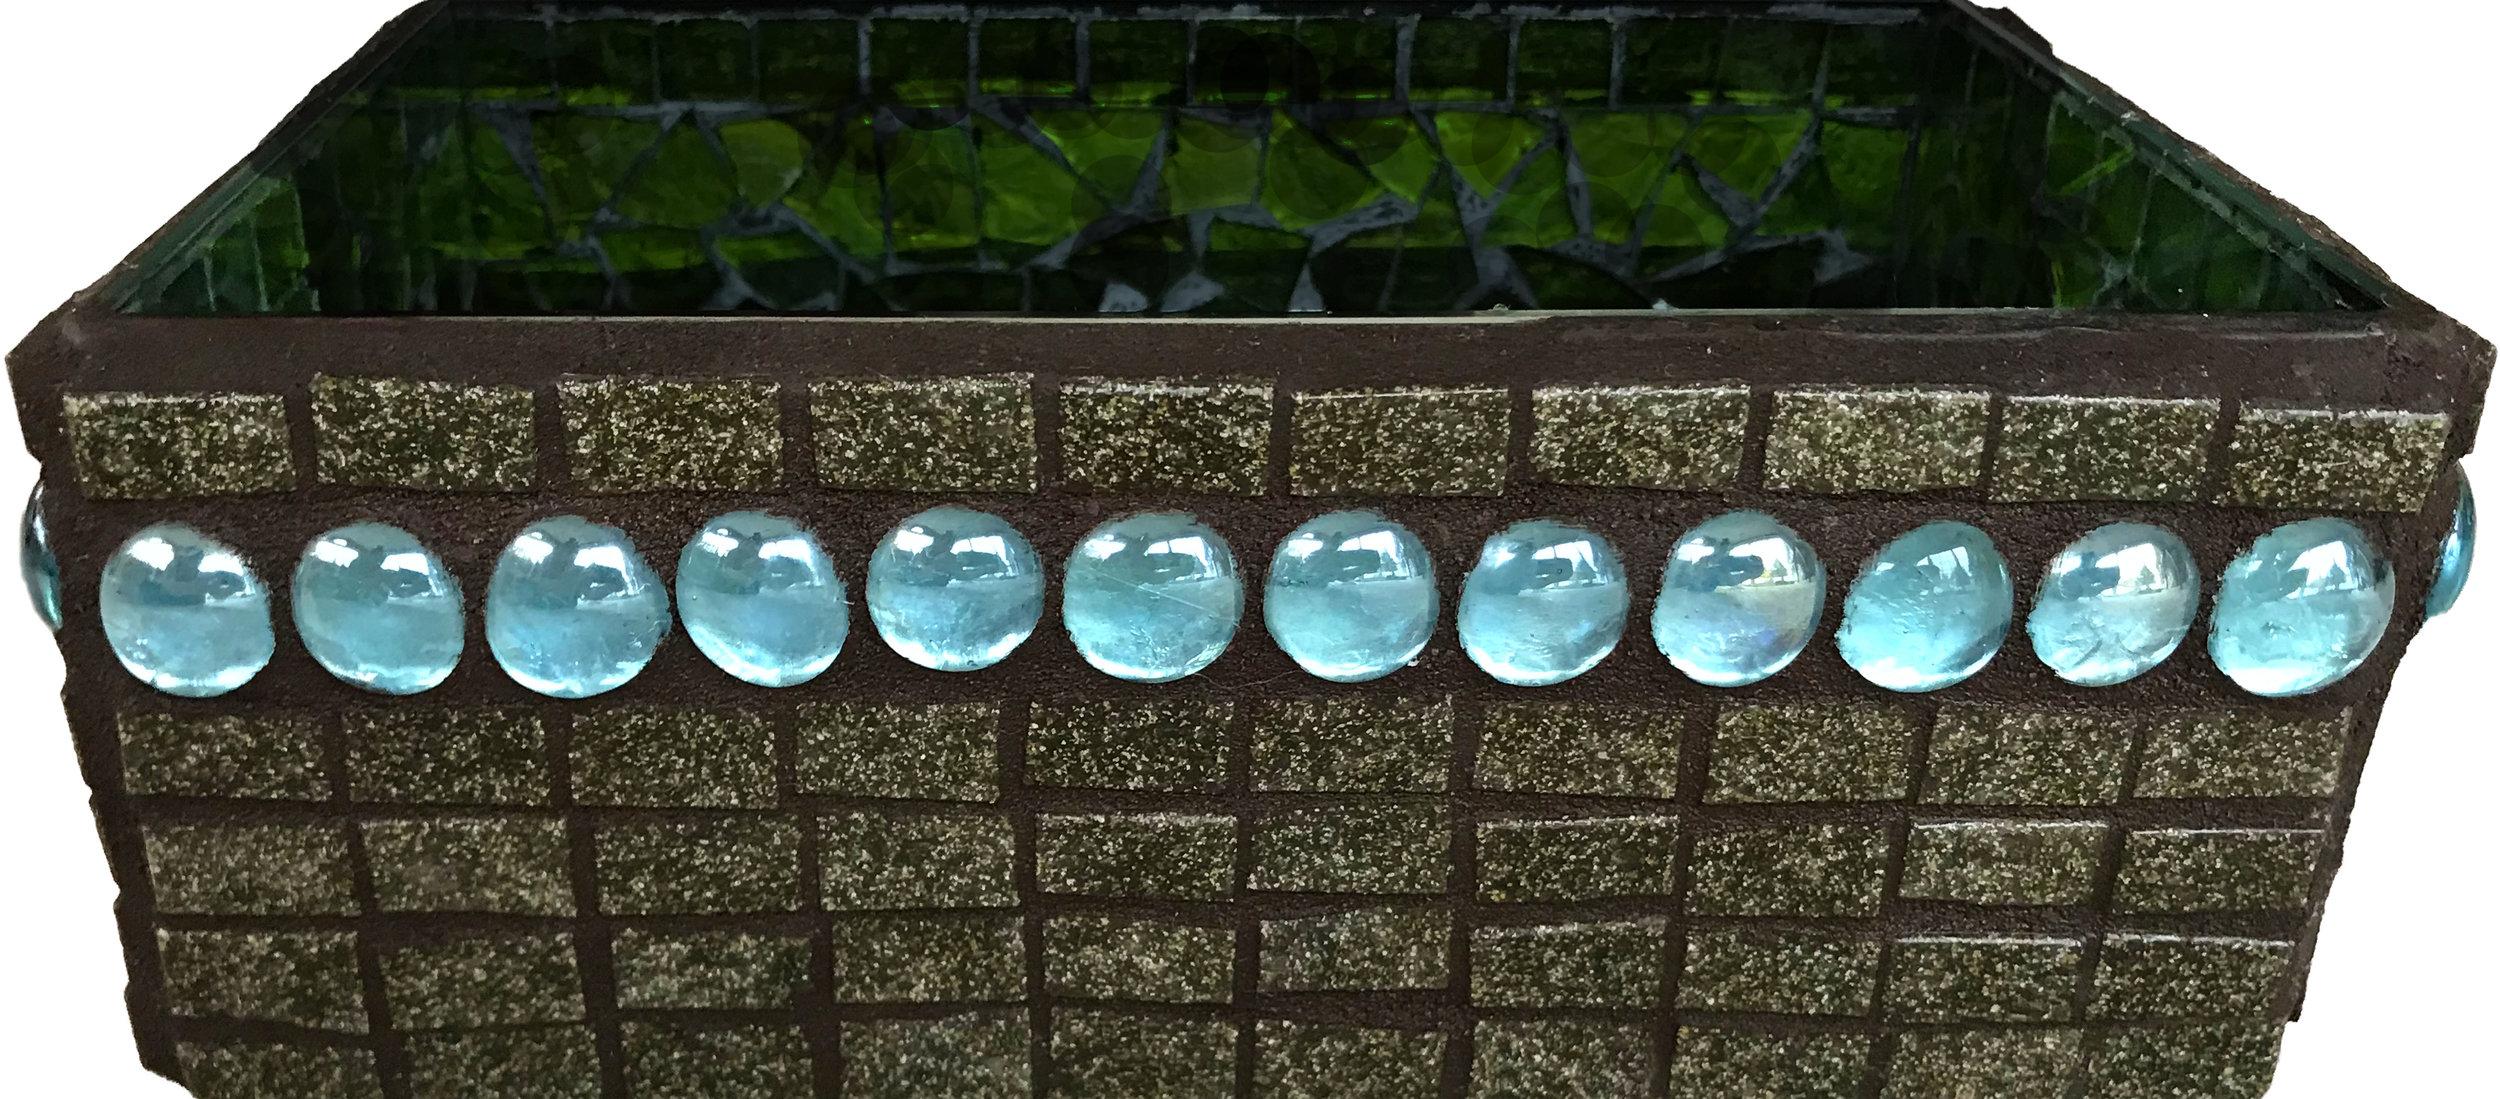 Brown-Blue Gem Mosaic Bin